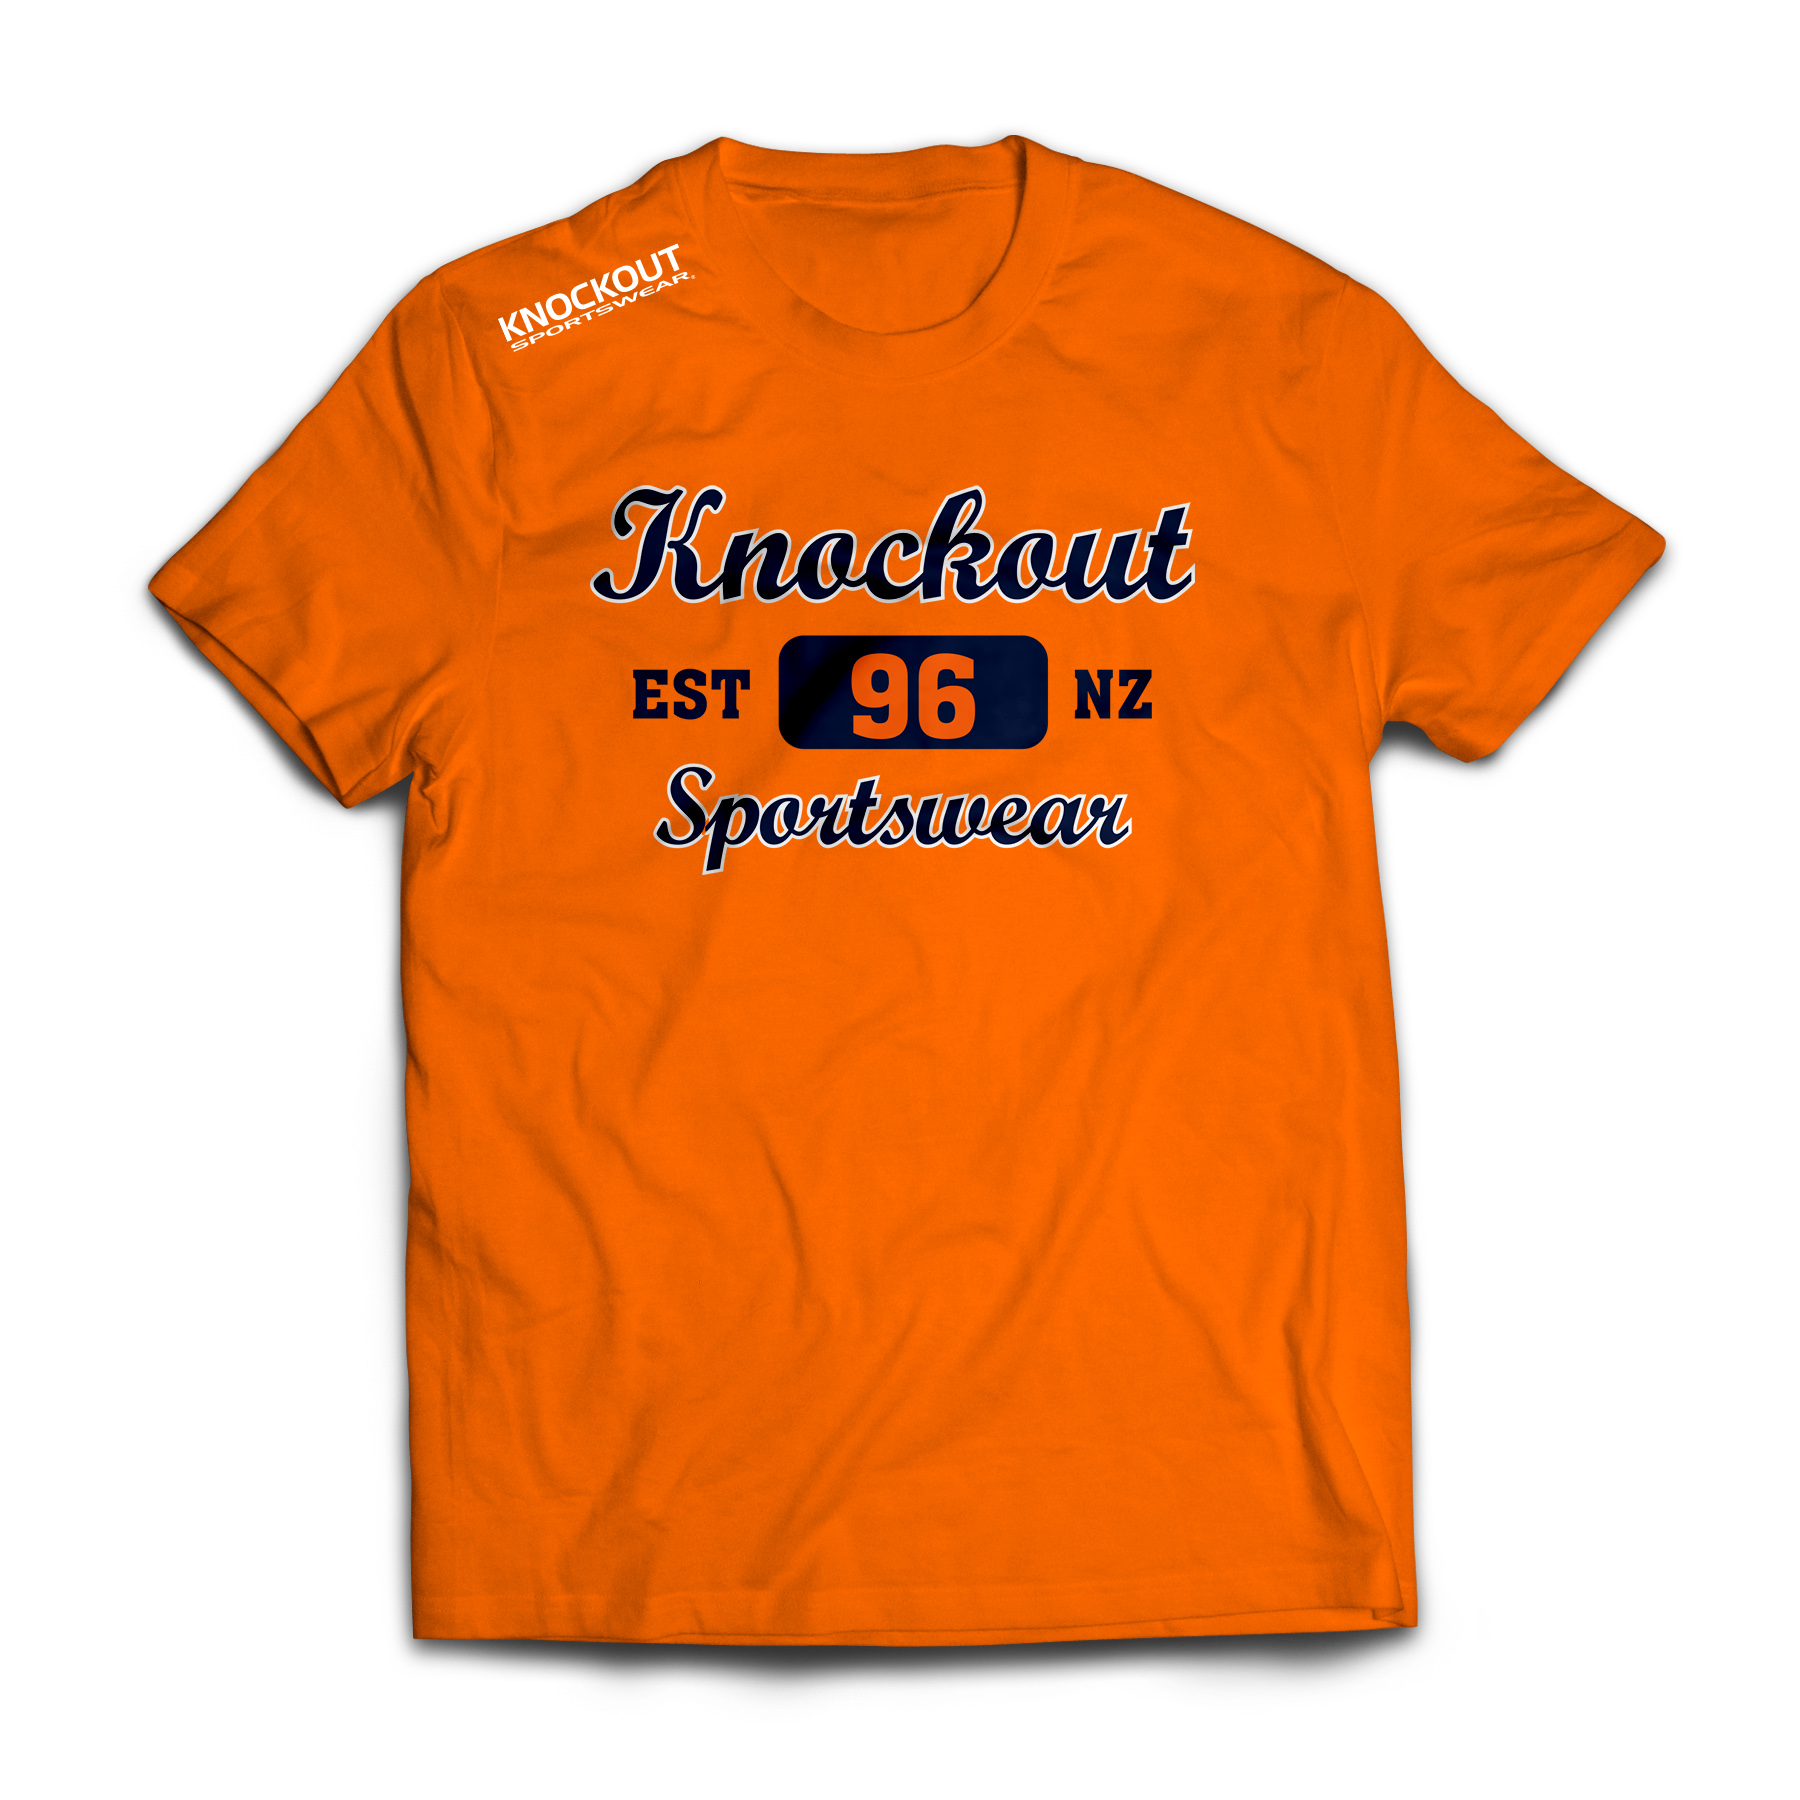 Knockout Sportswear Tee Shop   Classic Tee